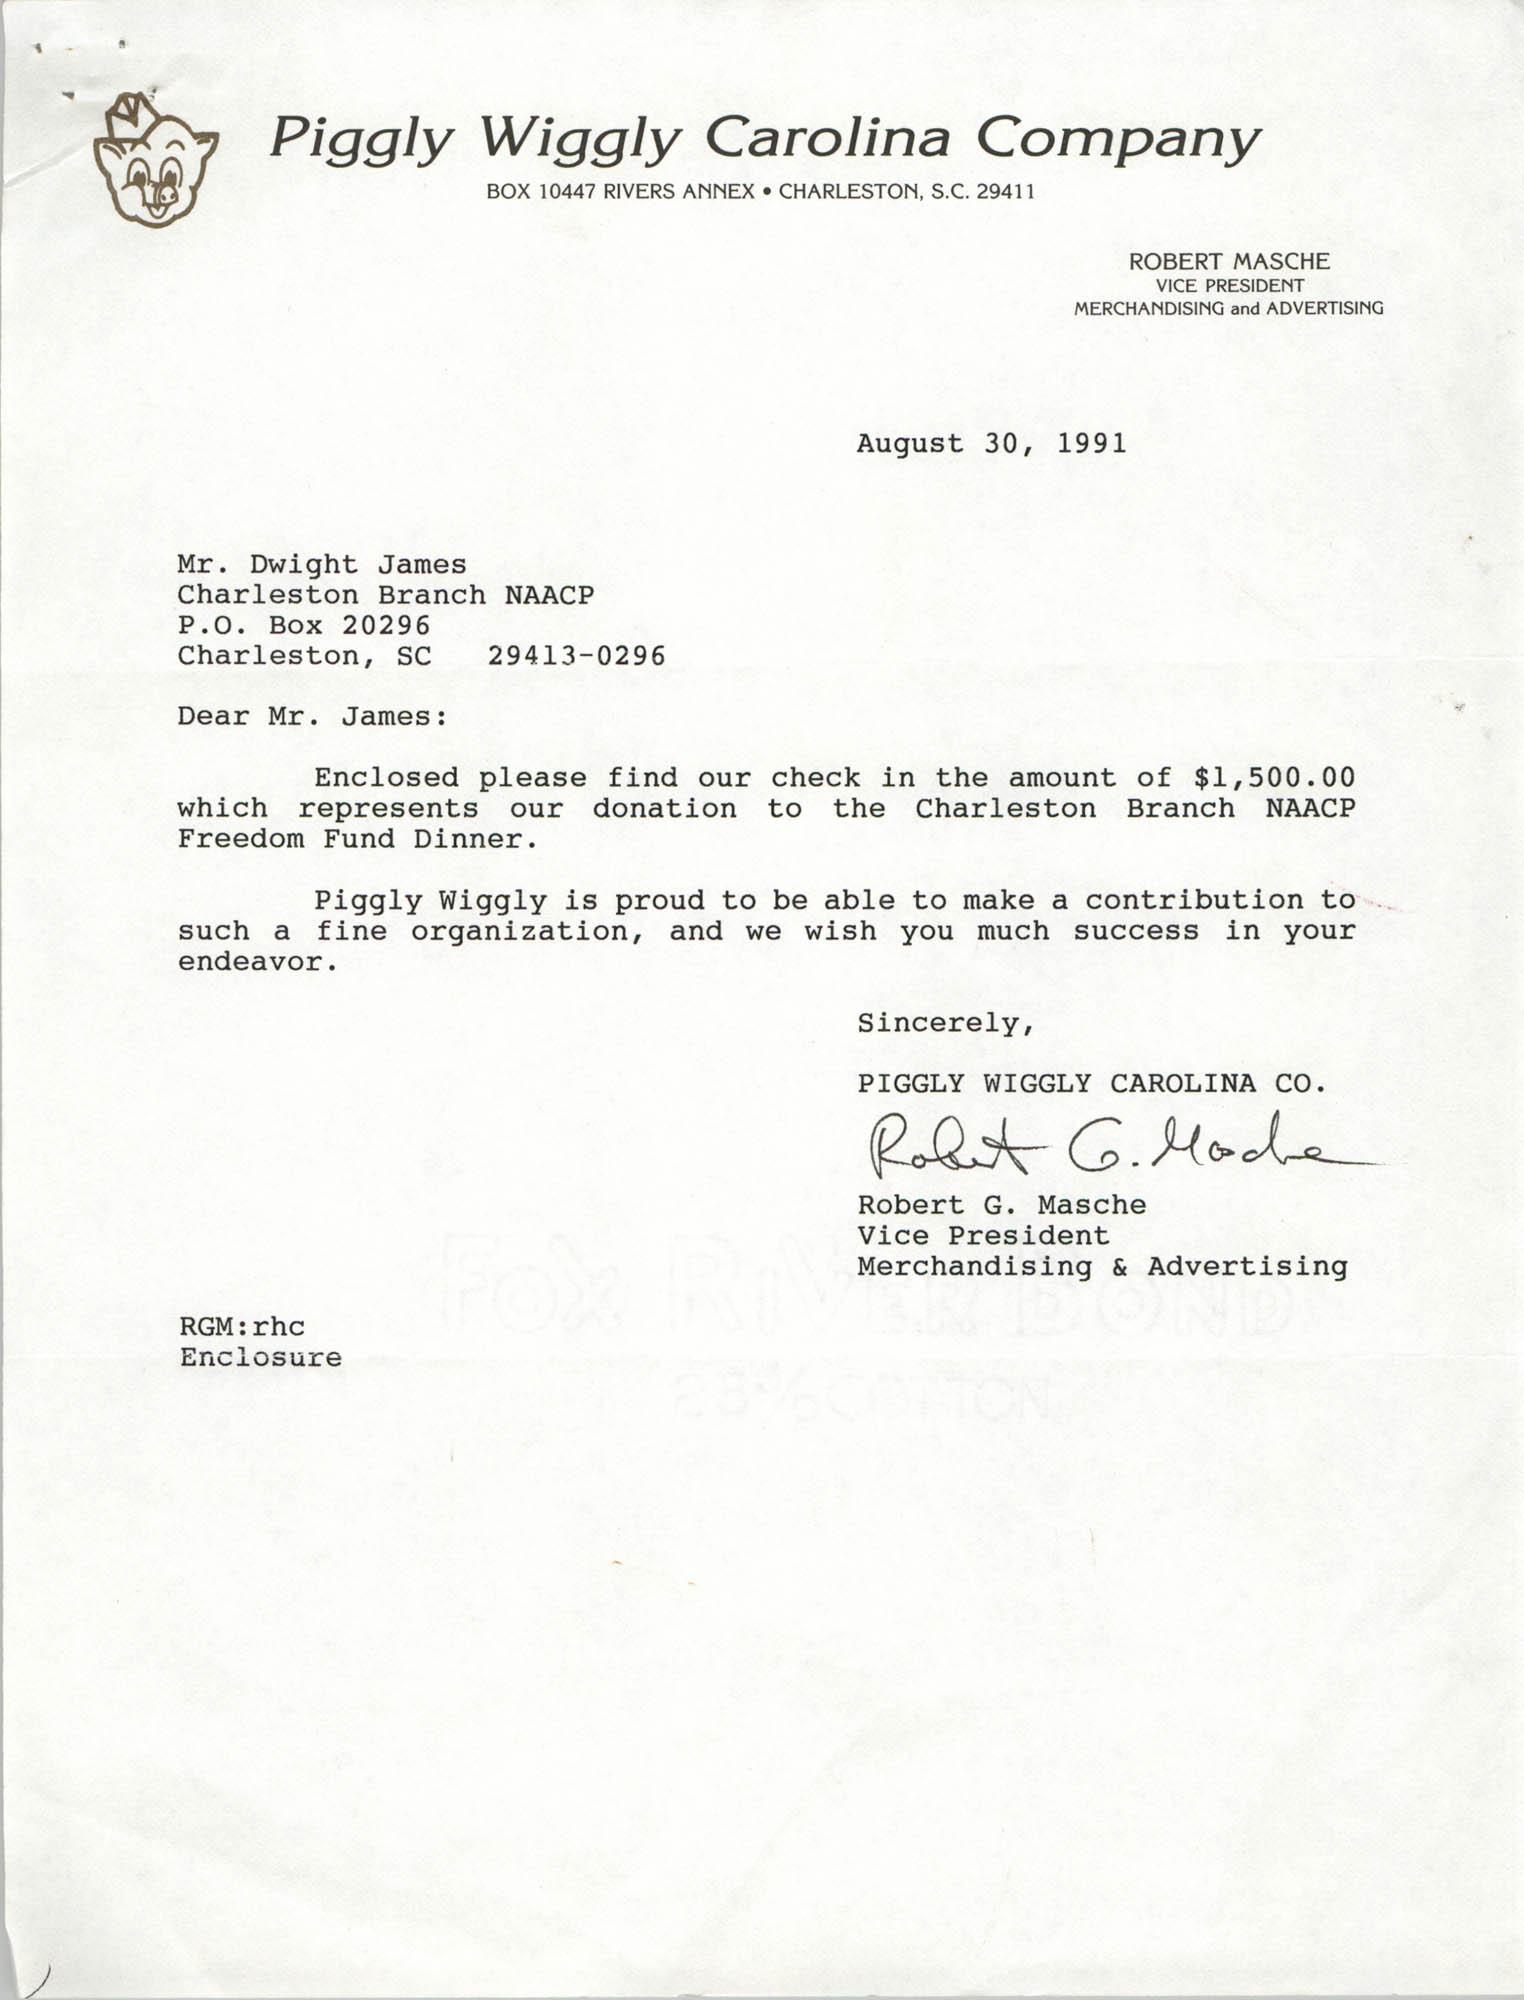 Letter from Robert G. Masche to Dwight James, August 30, 1991